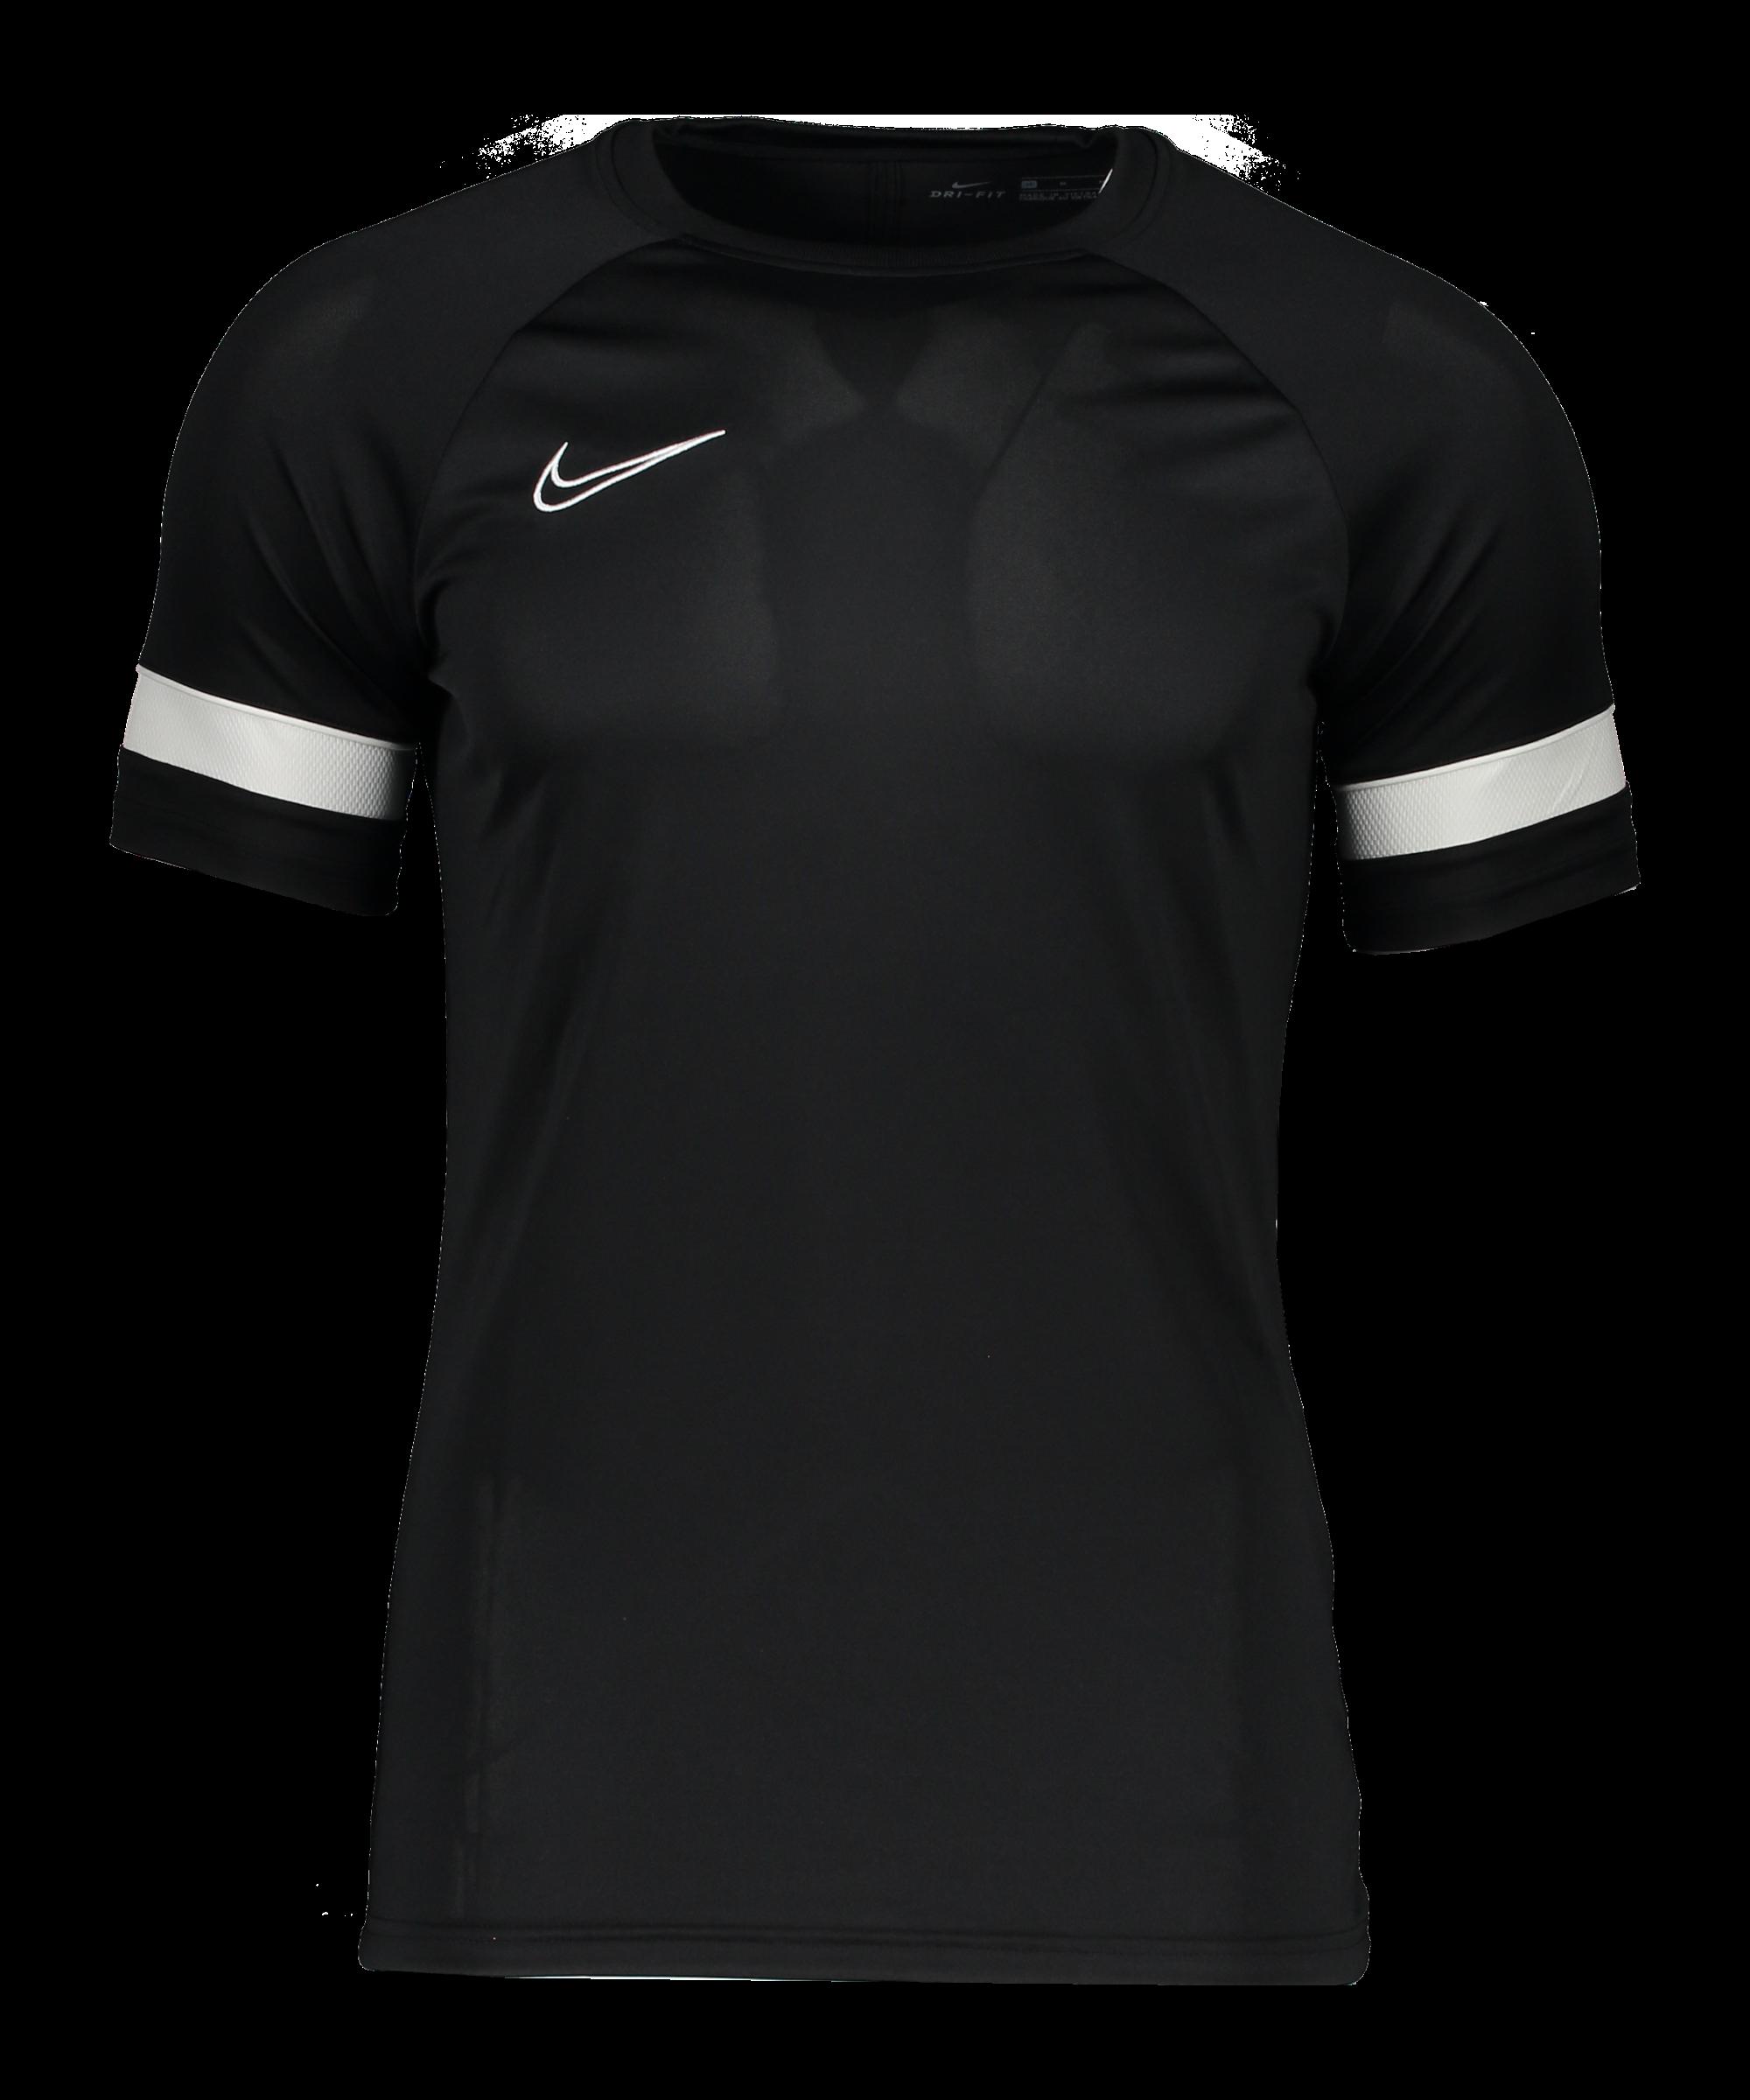 Nike Academy 21 T-Shirt